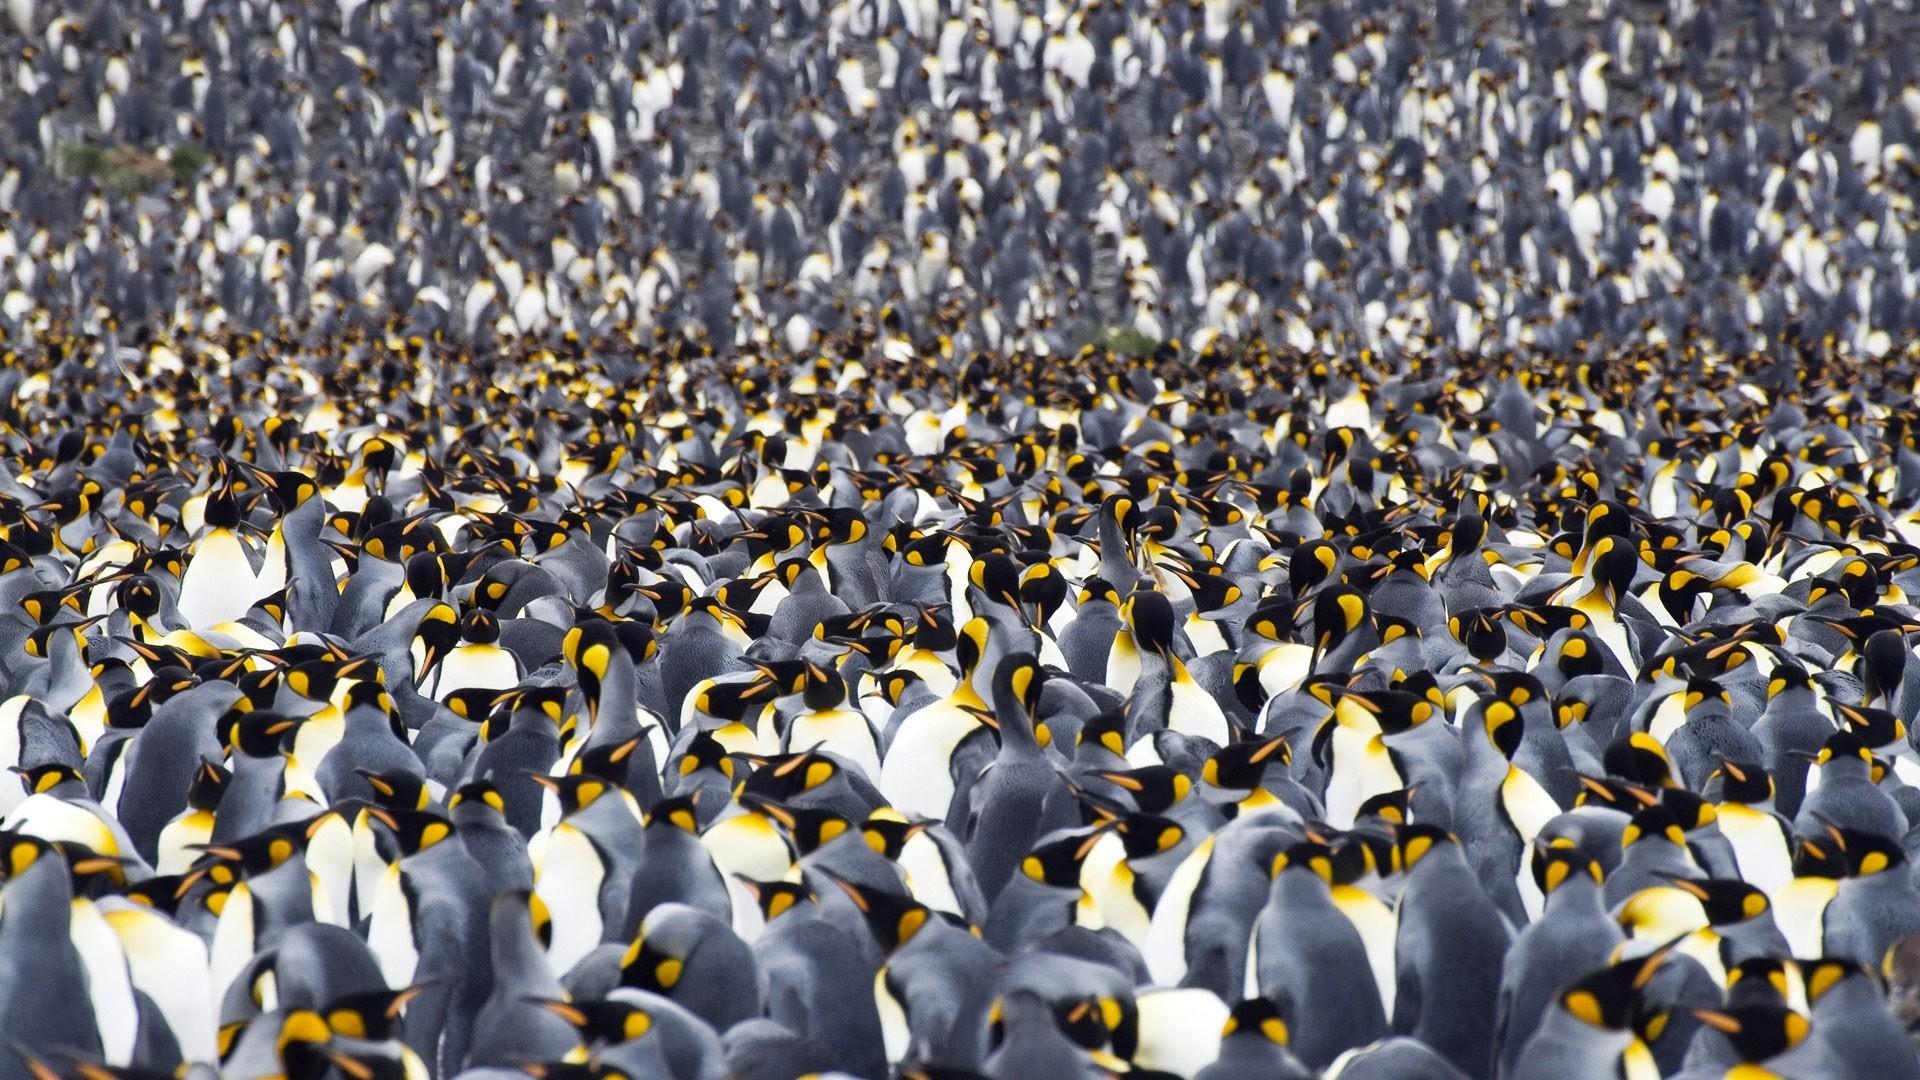 Penguin hd desktop wallpaper